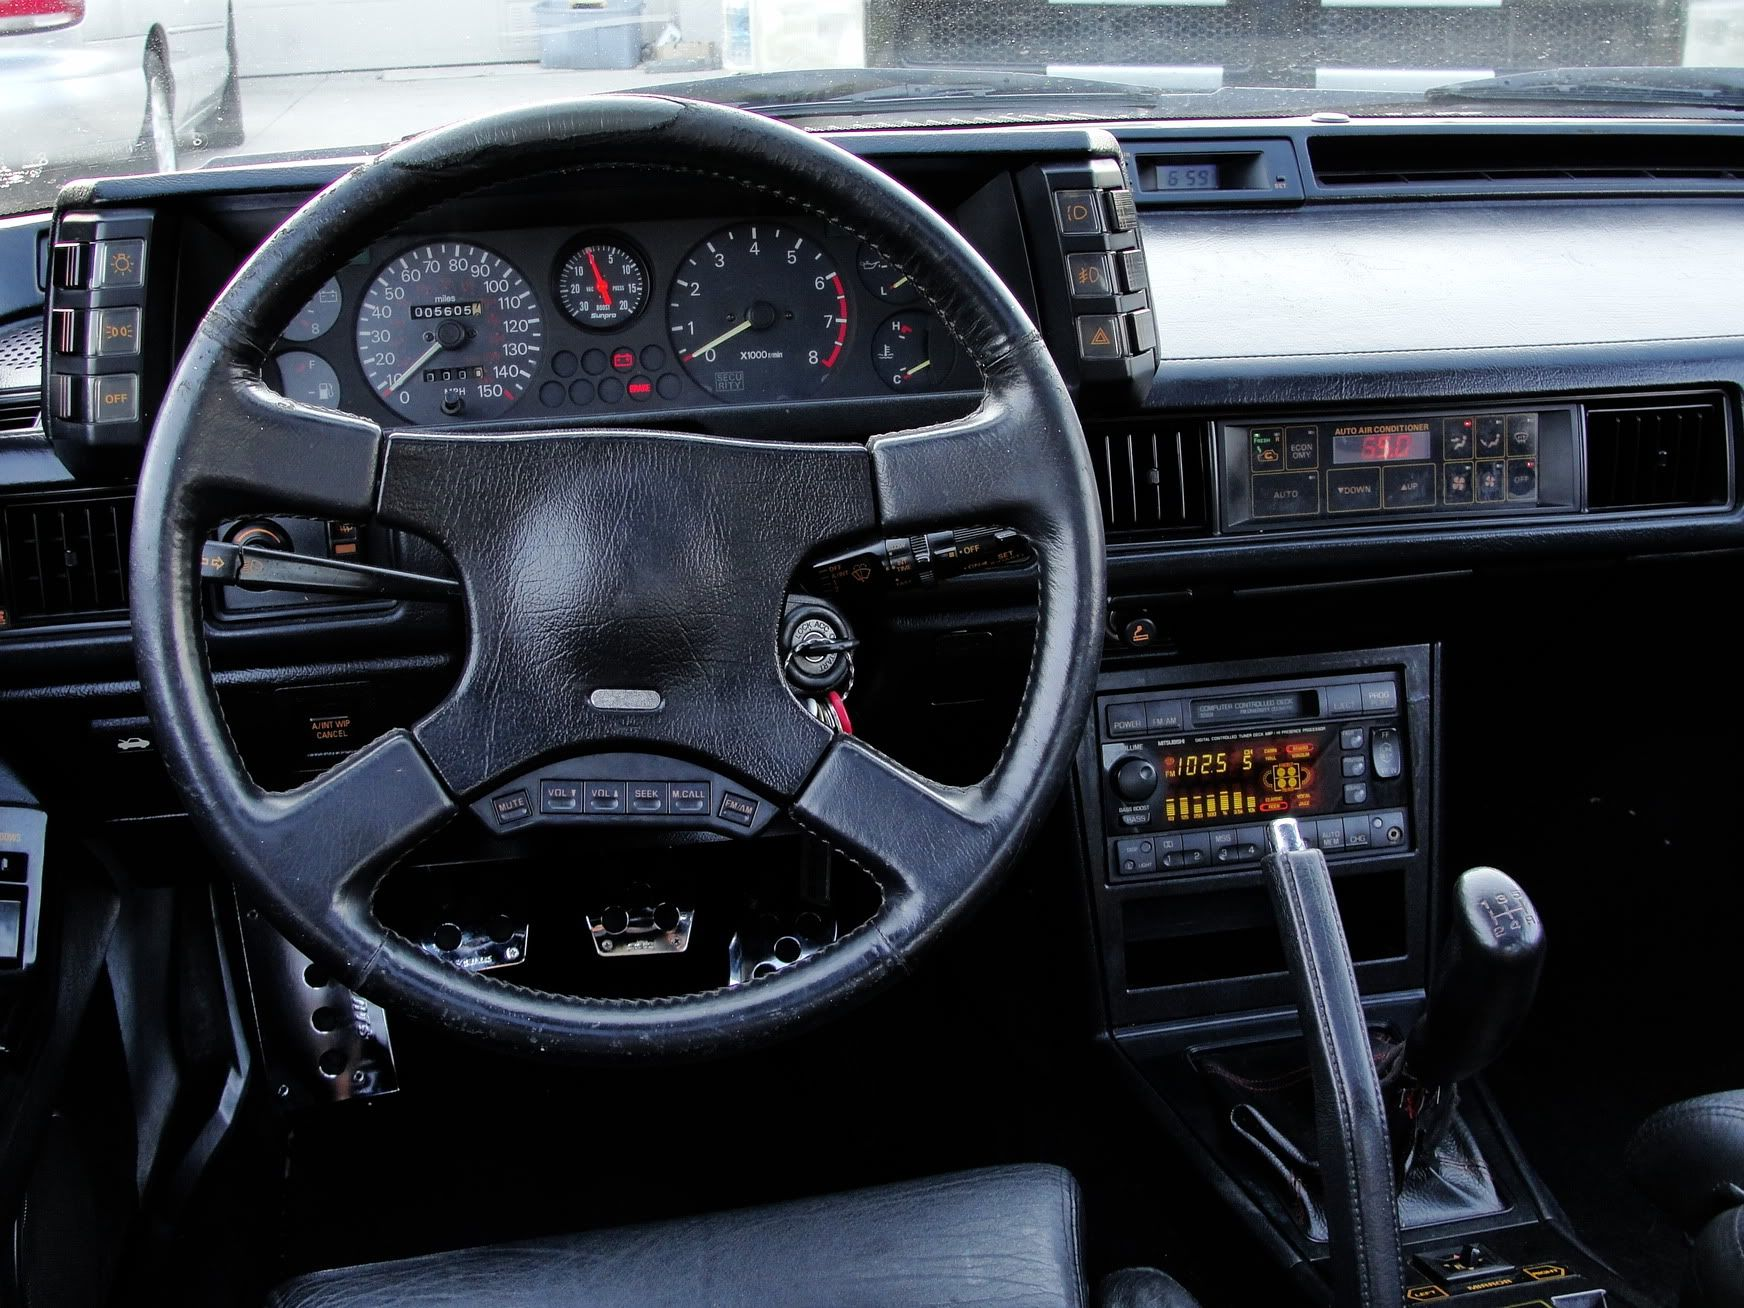 1984 Dodge Conquest Google Search Dodge Cars